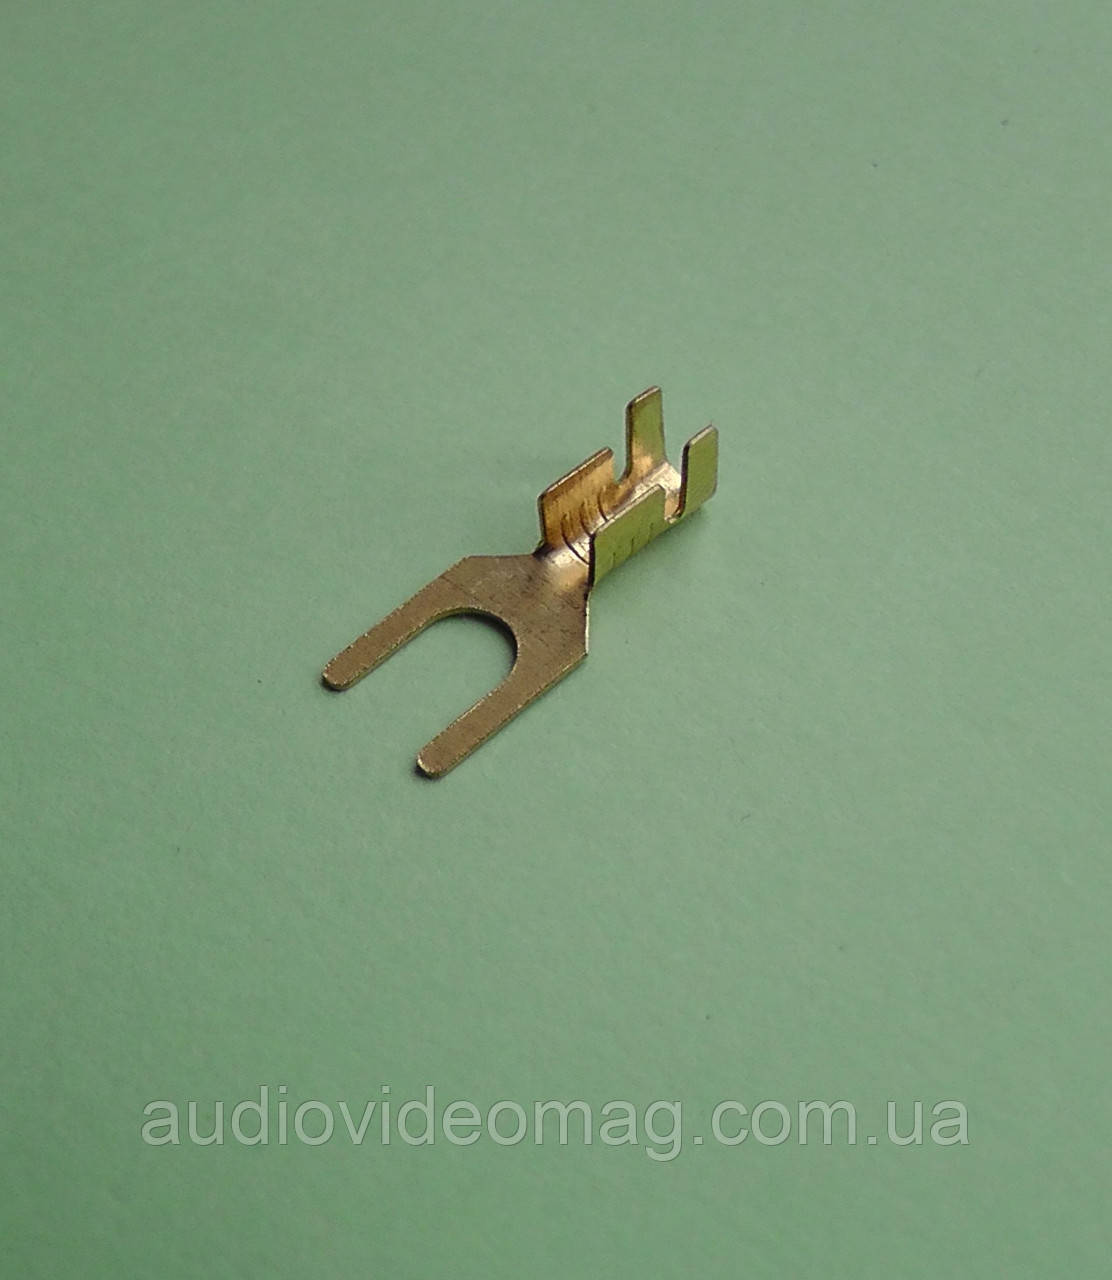 Клемма вилочная под контакт 4 мм , упаковка 50 шт.